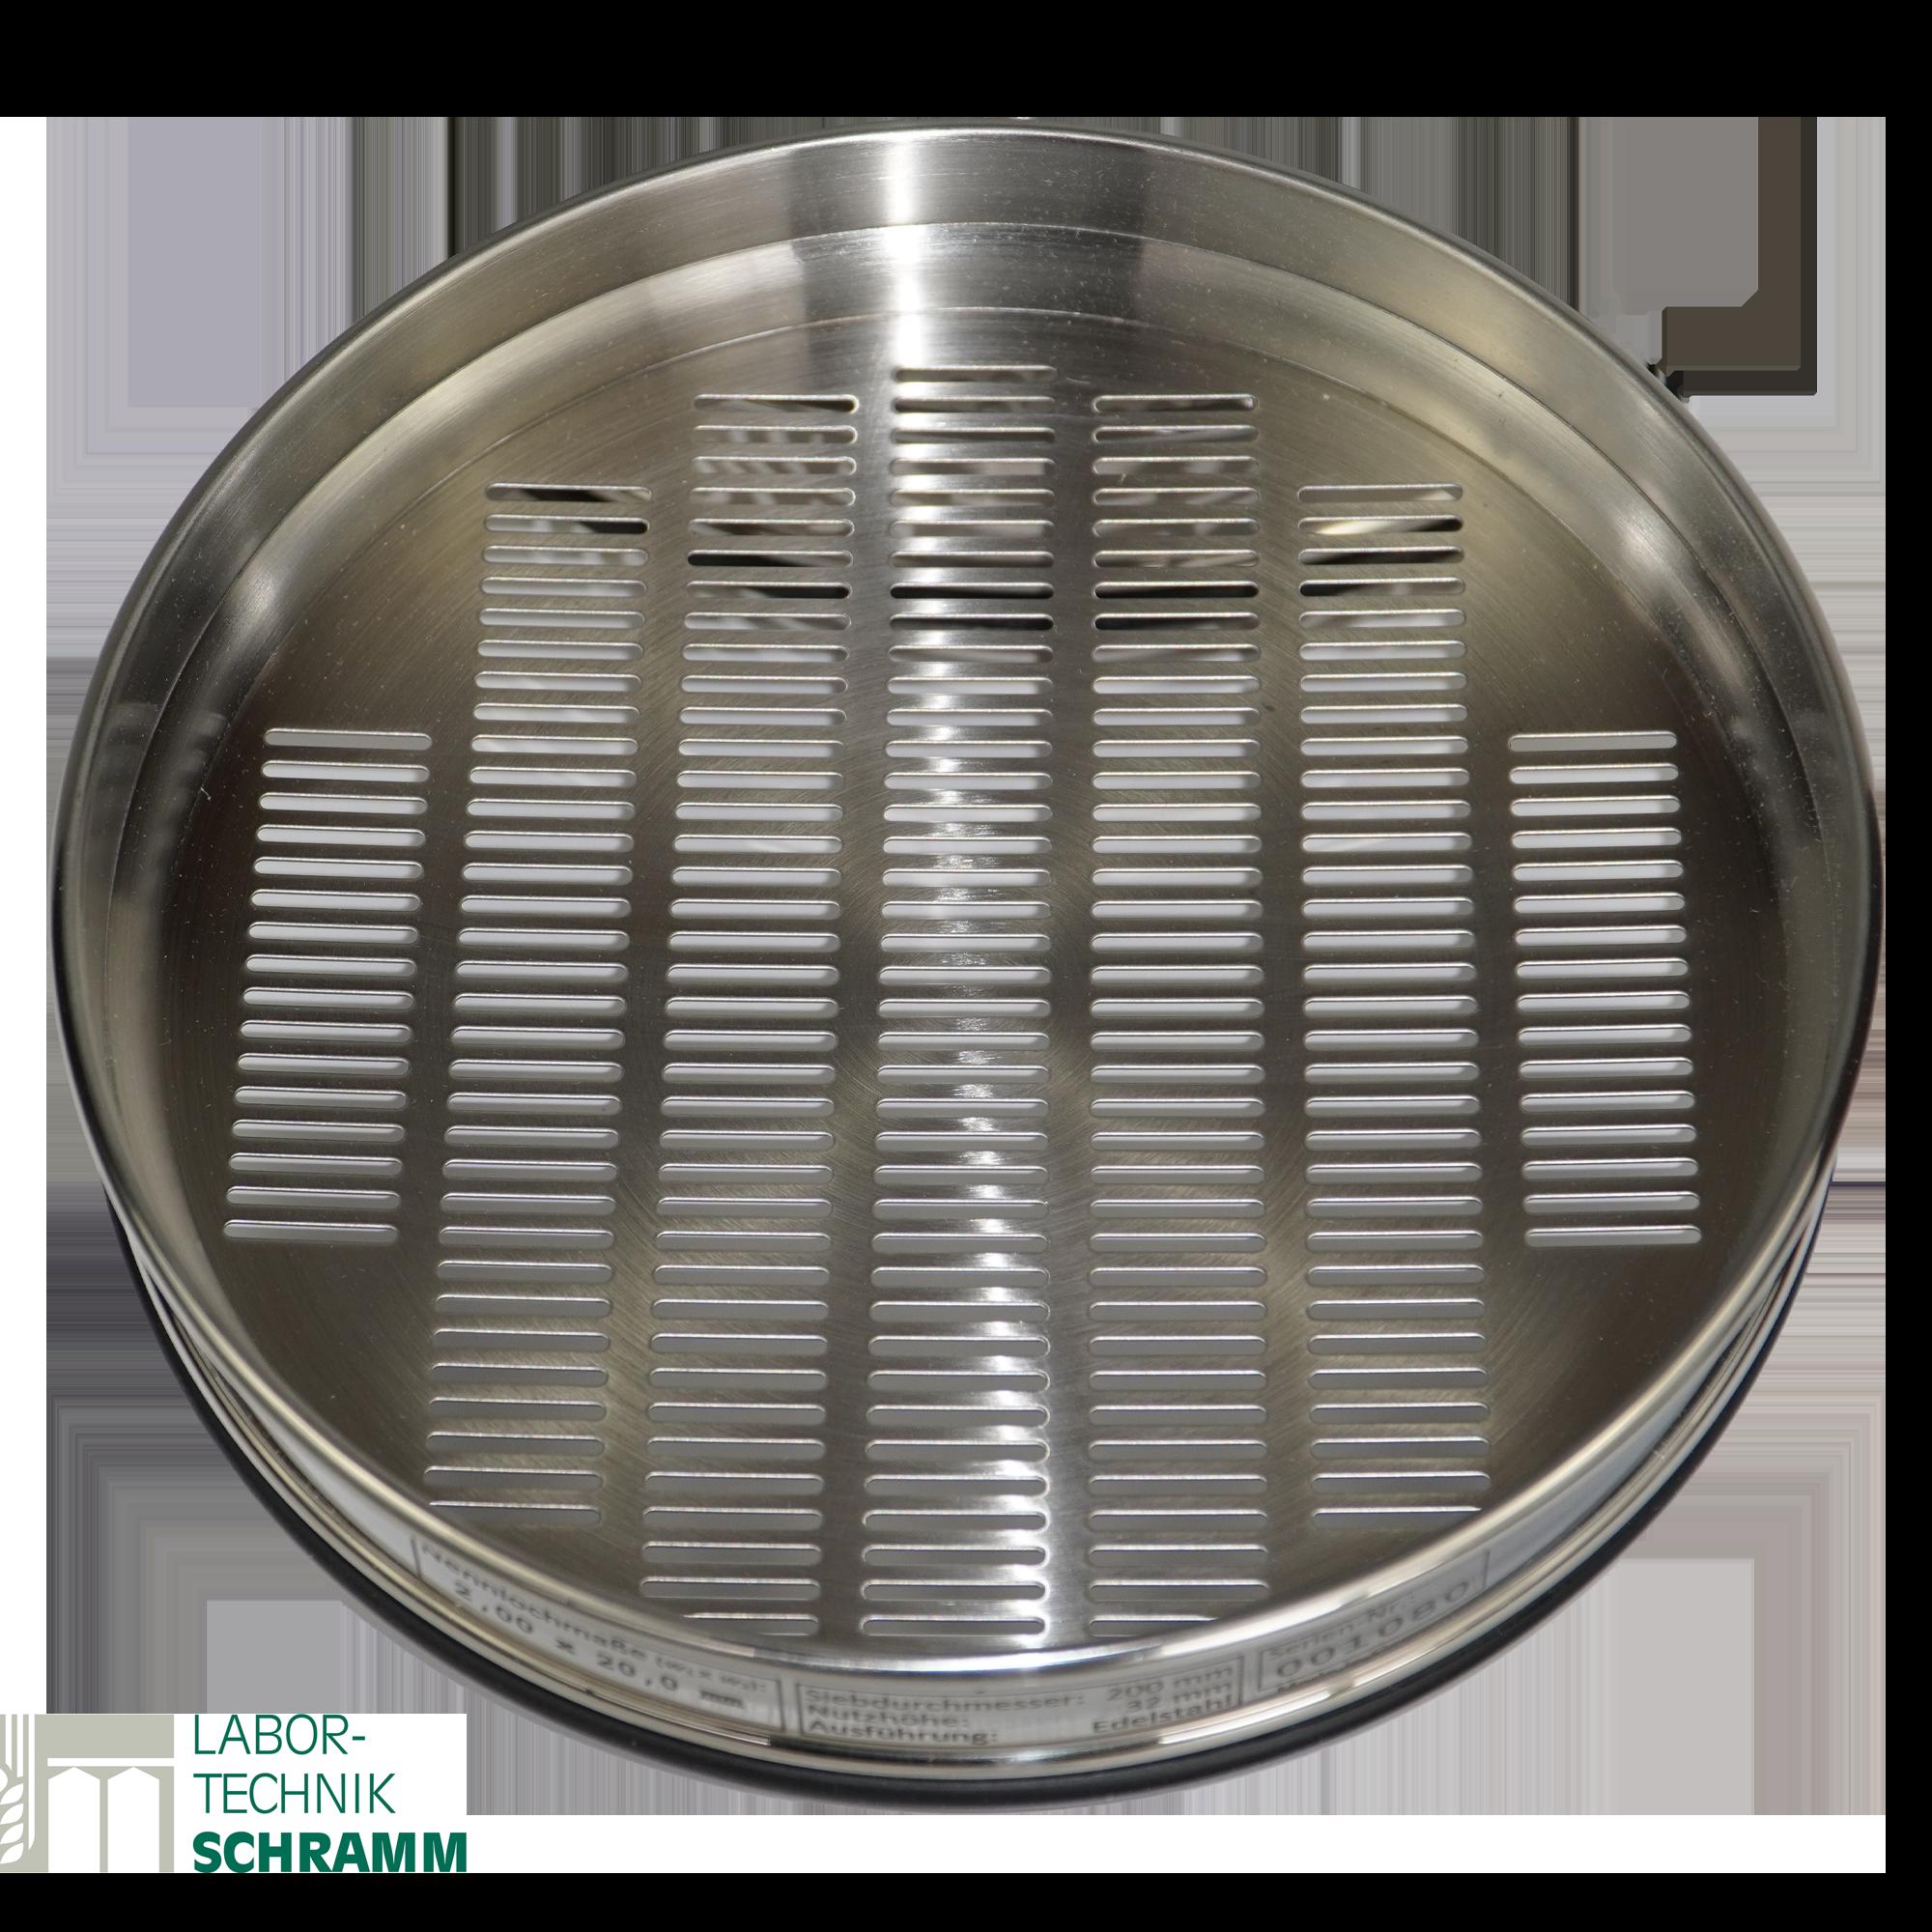 Sieb /200 SL 1,8 mm ISO 5223        Roggen / Triticale